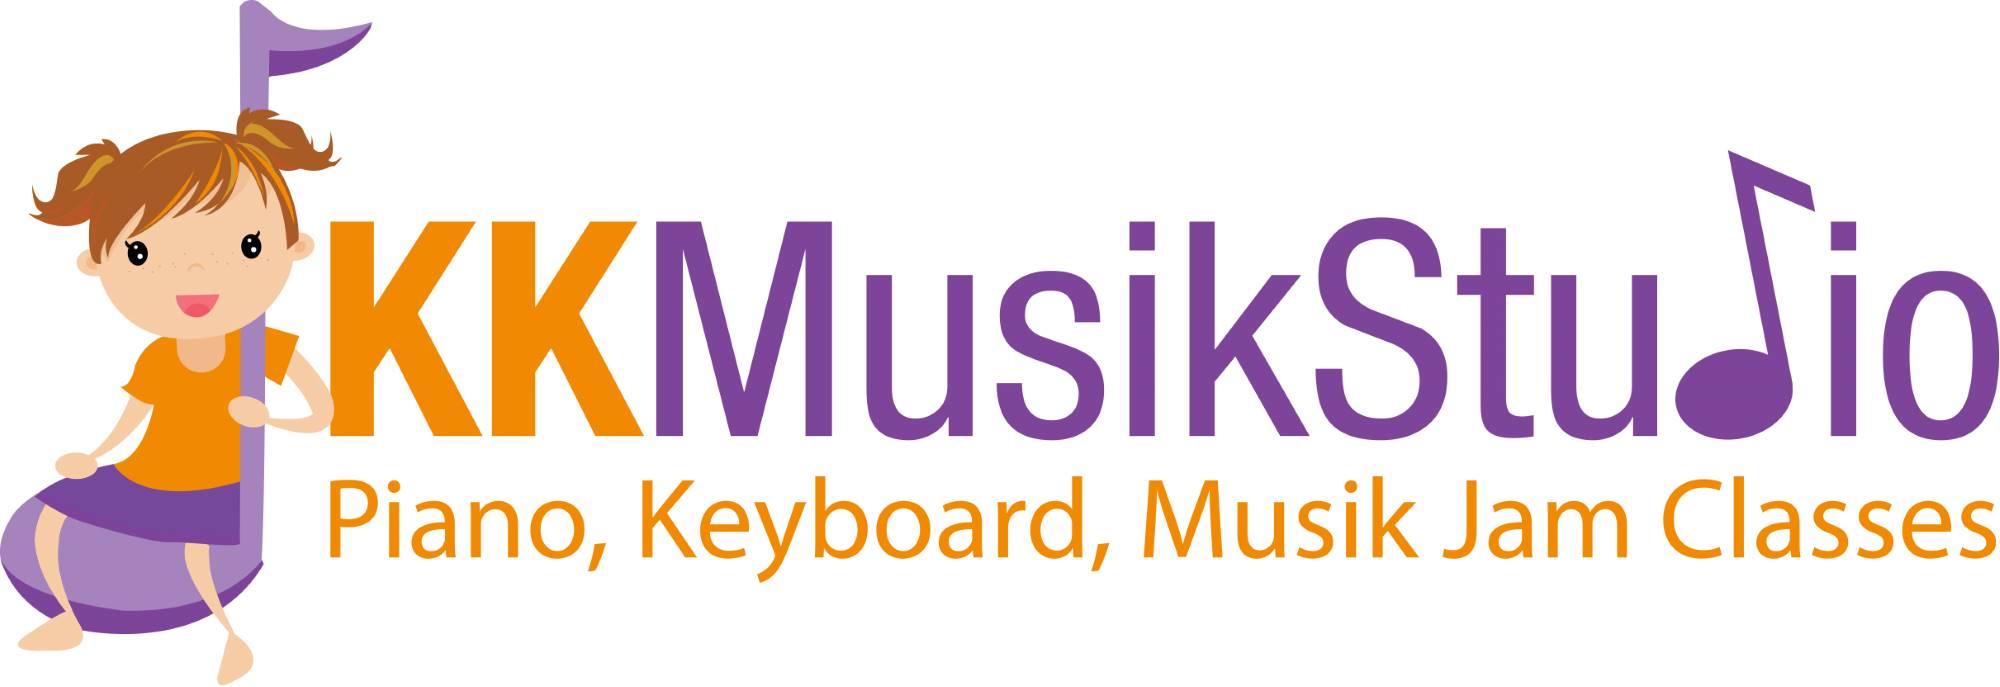 kk musik studio wentworth falls blue mountains music classes